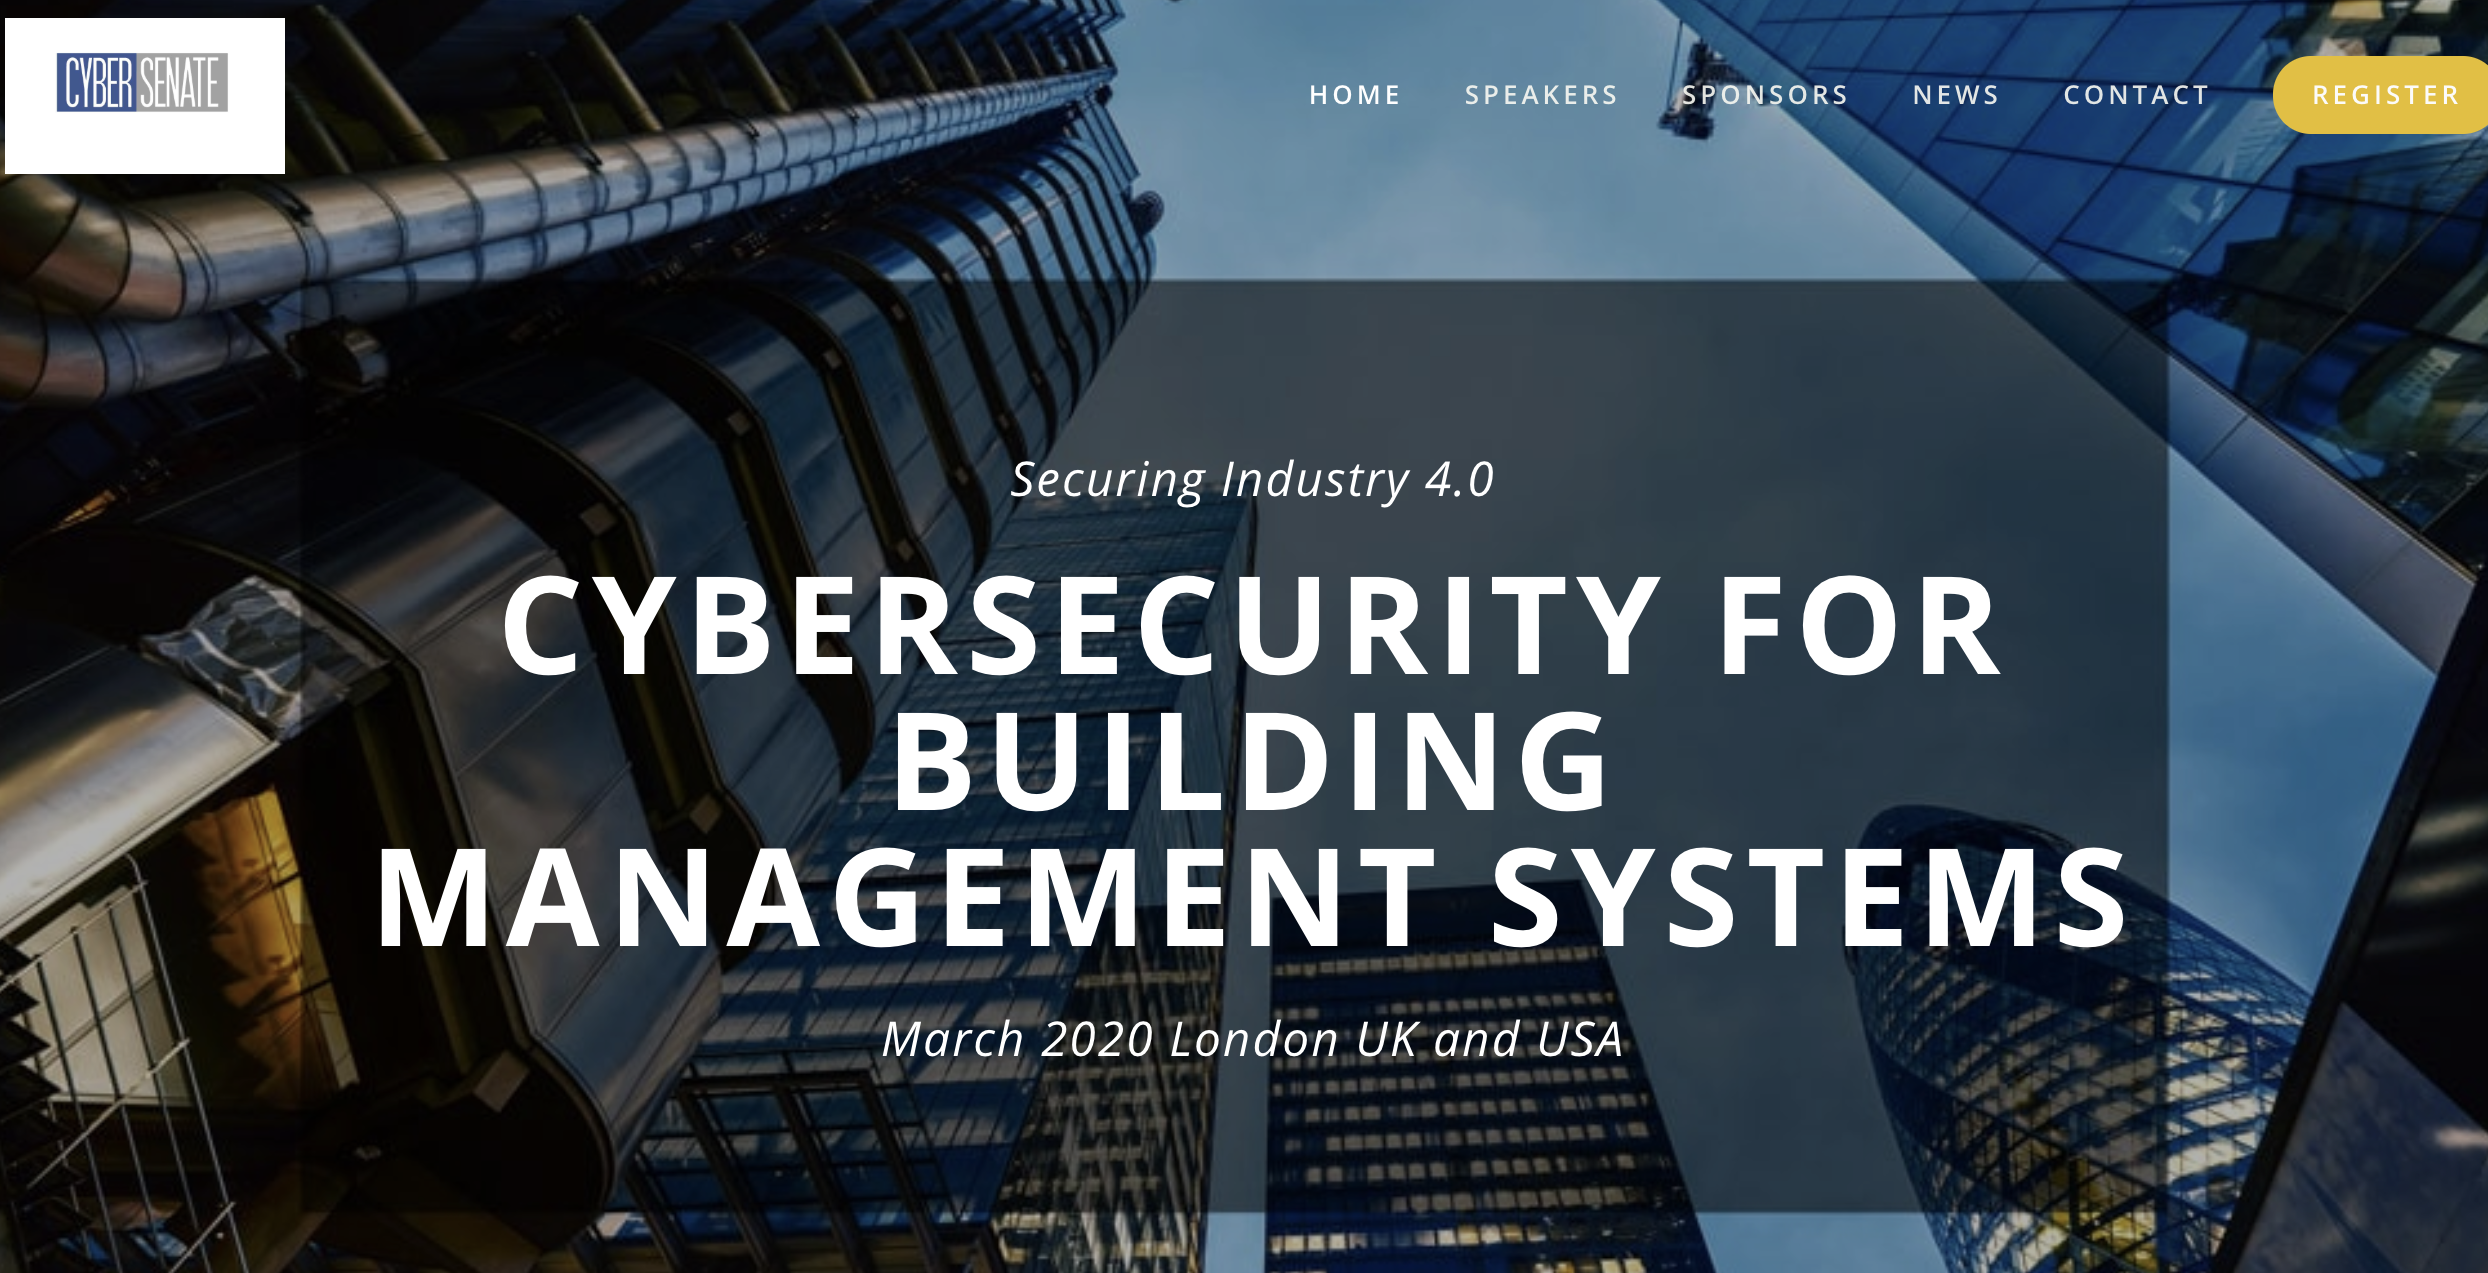 Cyber Senate News — CYBER SENATE